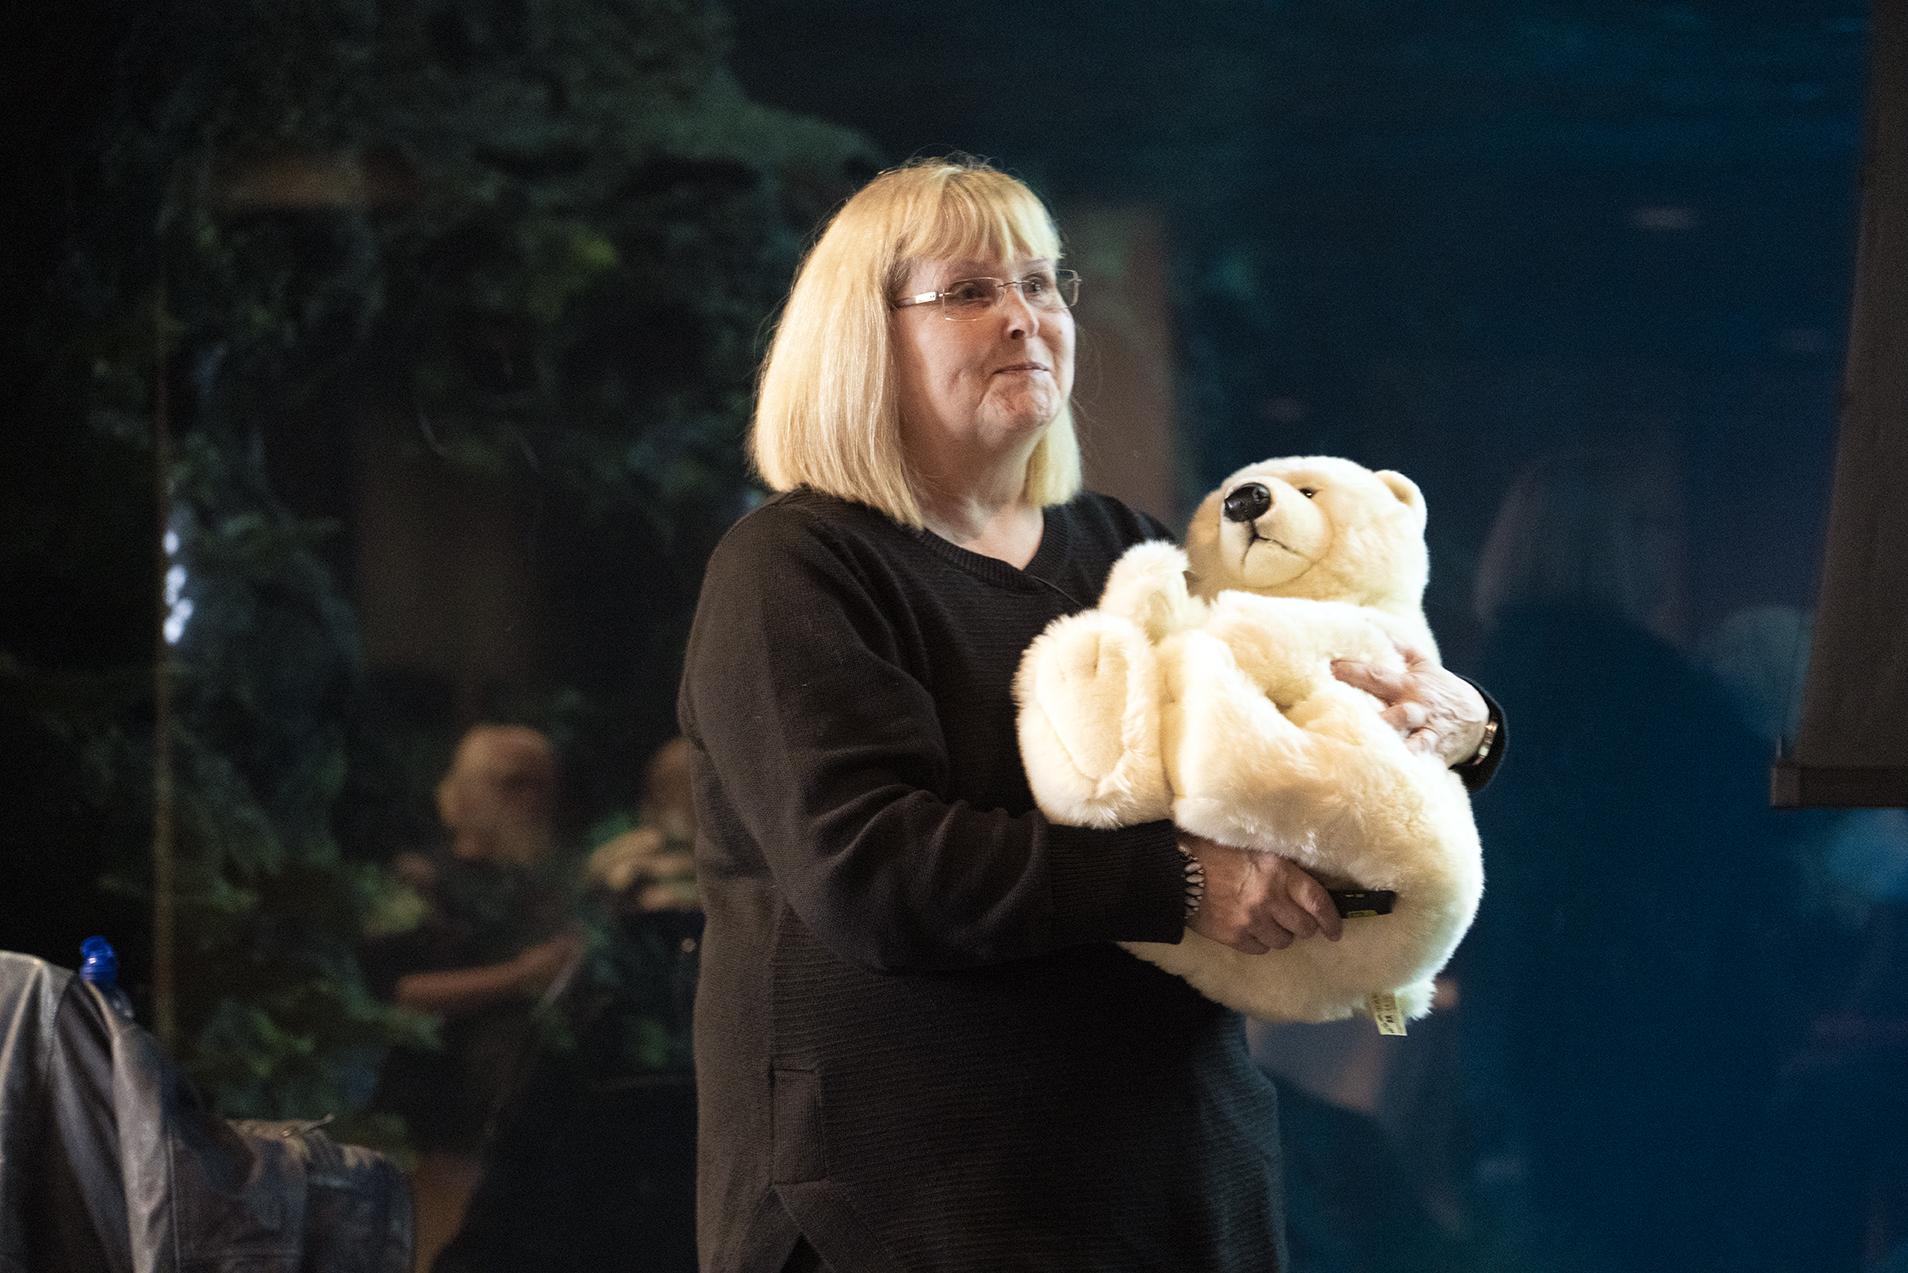 IJsberenlezing Susan Crockford in Blijdorp